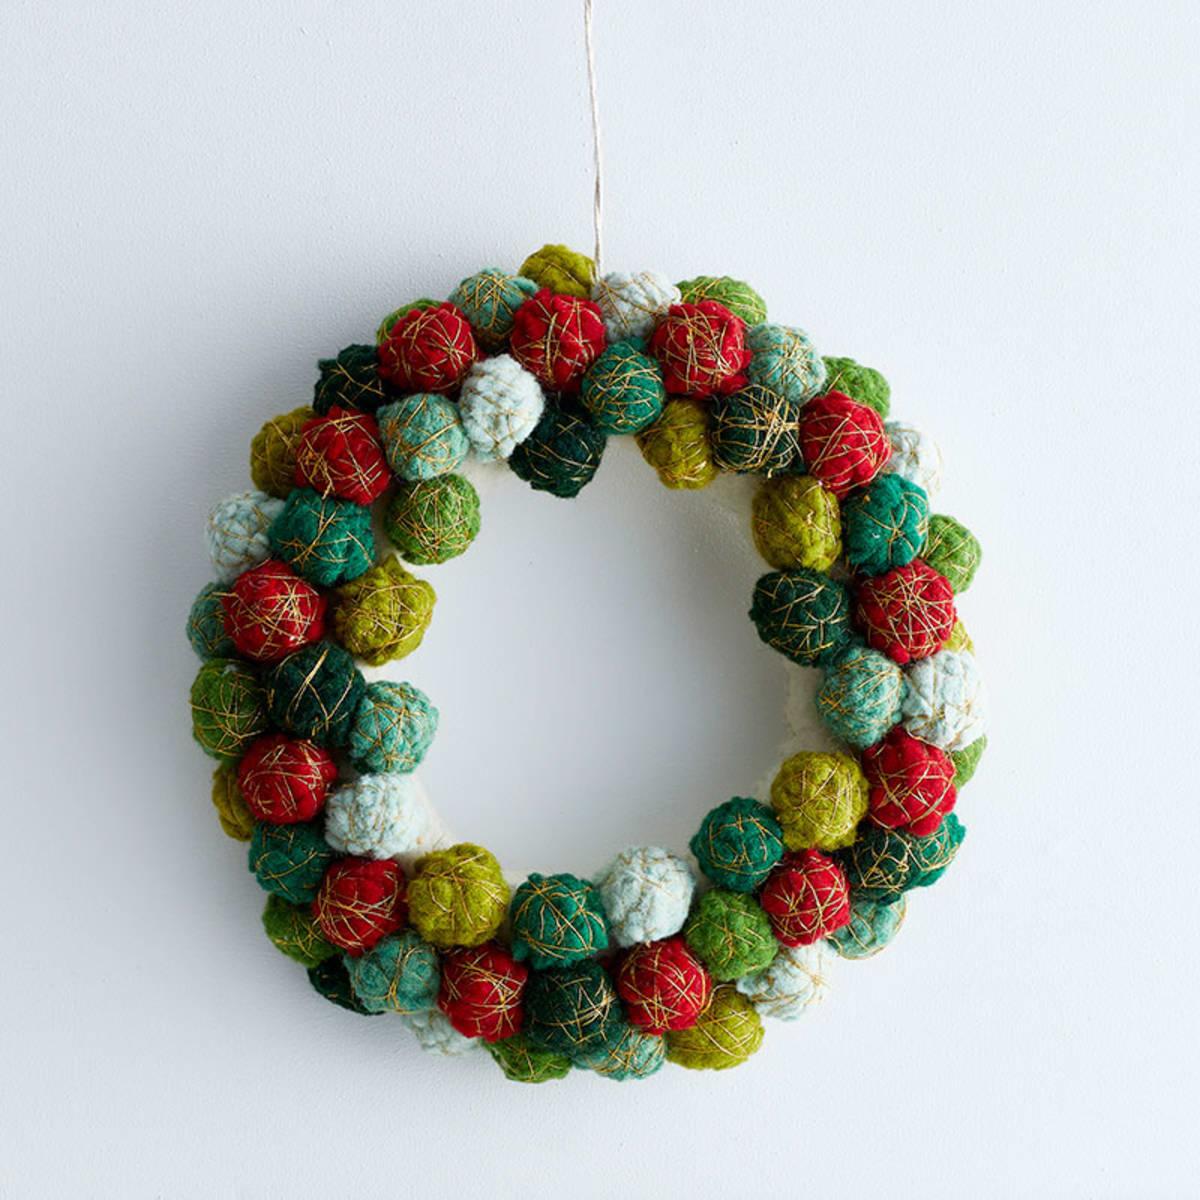 Multi Colored Pom Pom Holiday Felt Wreath